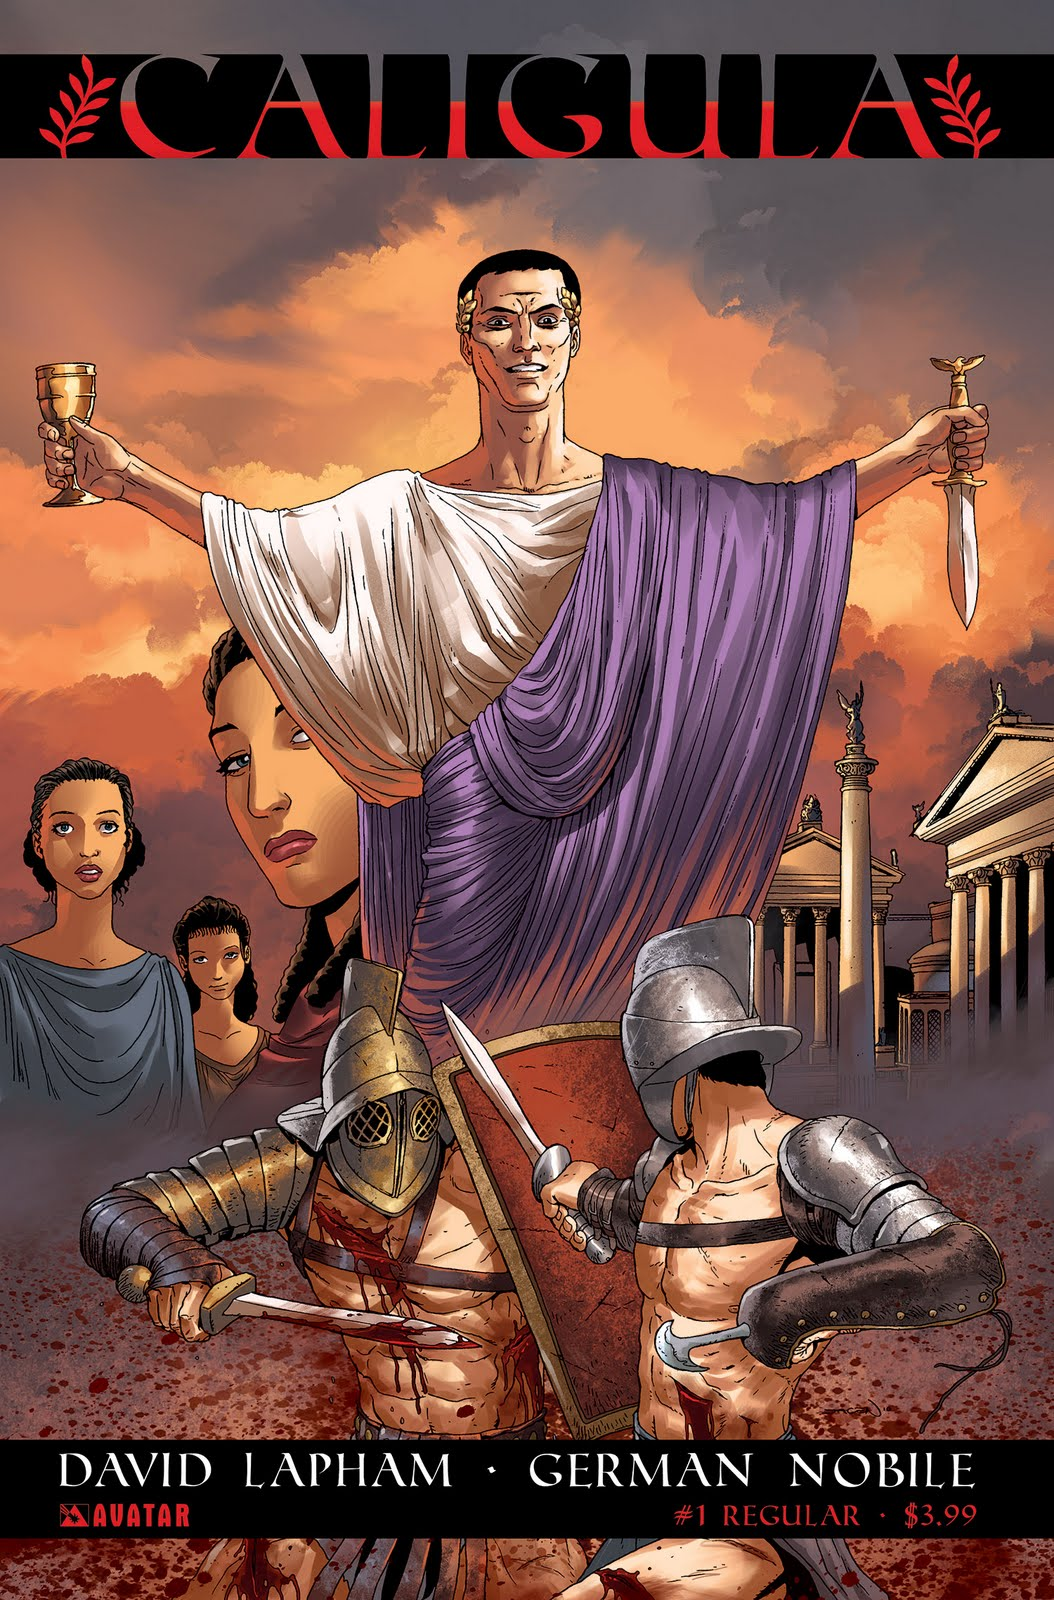 Caligula Movie Poster